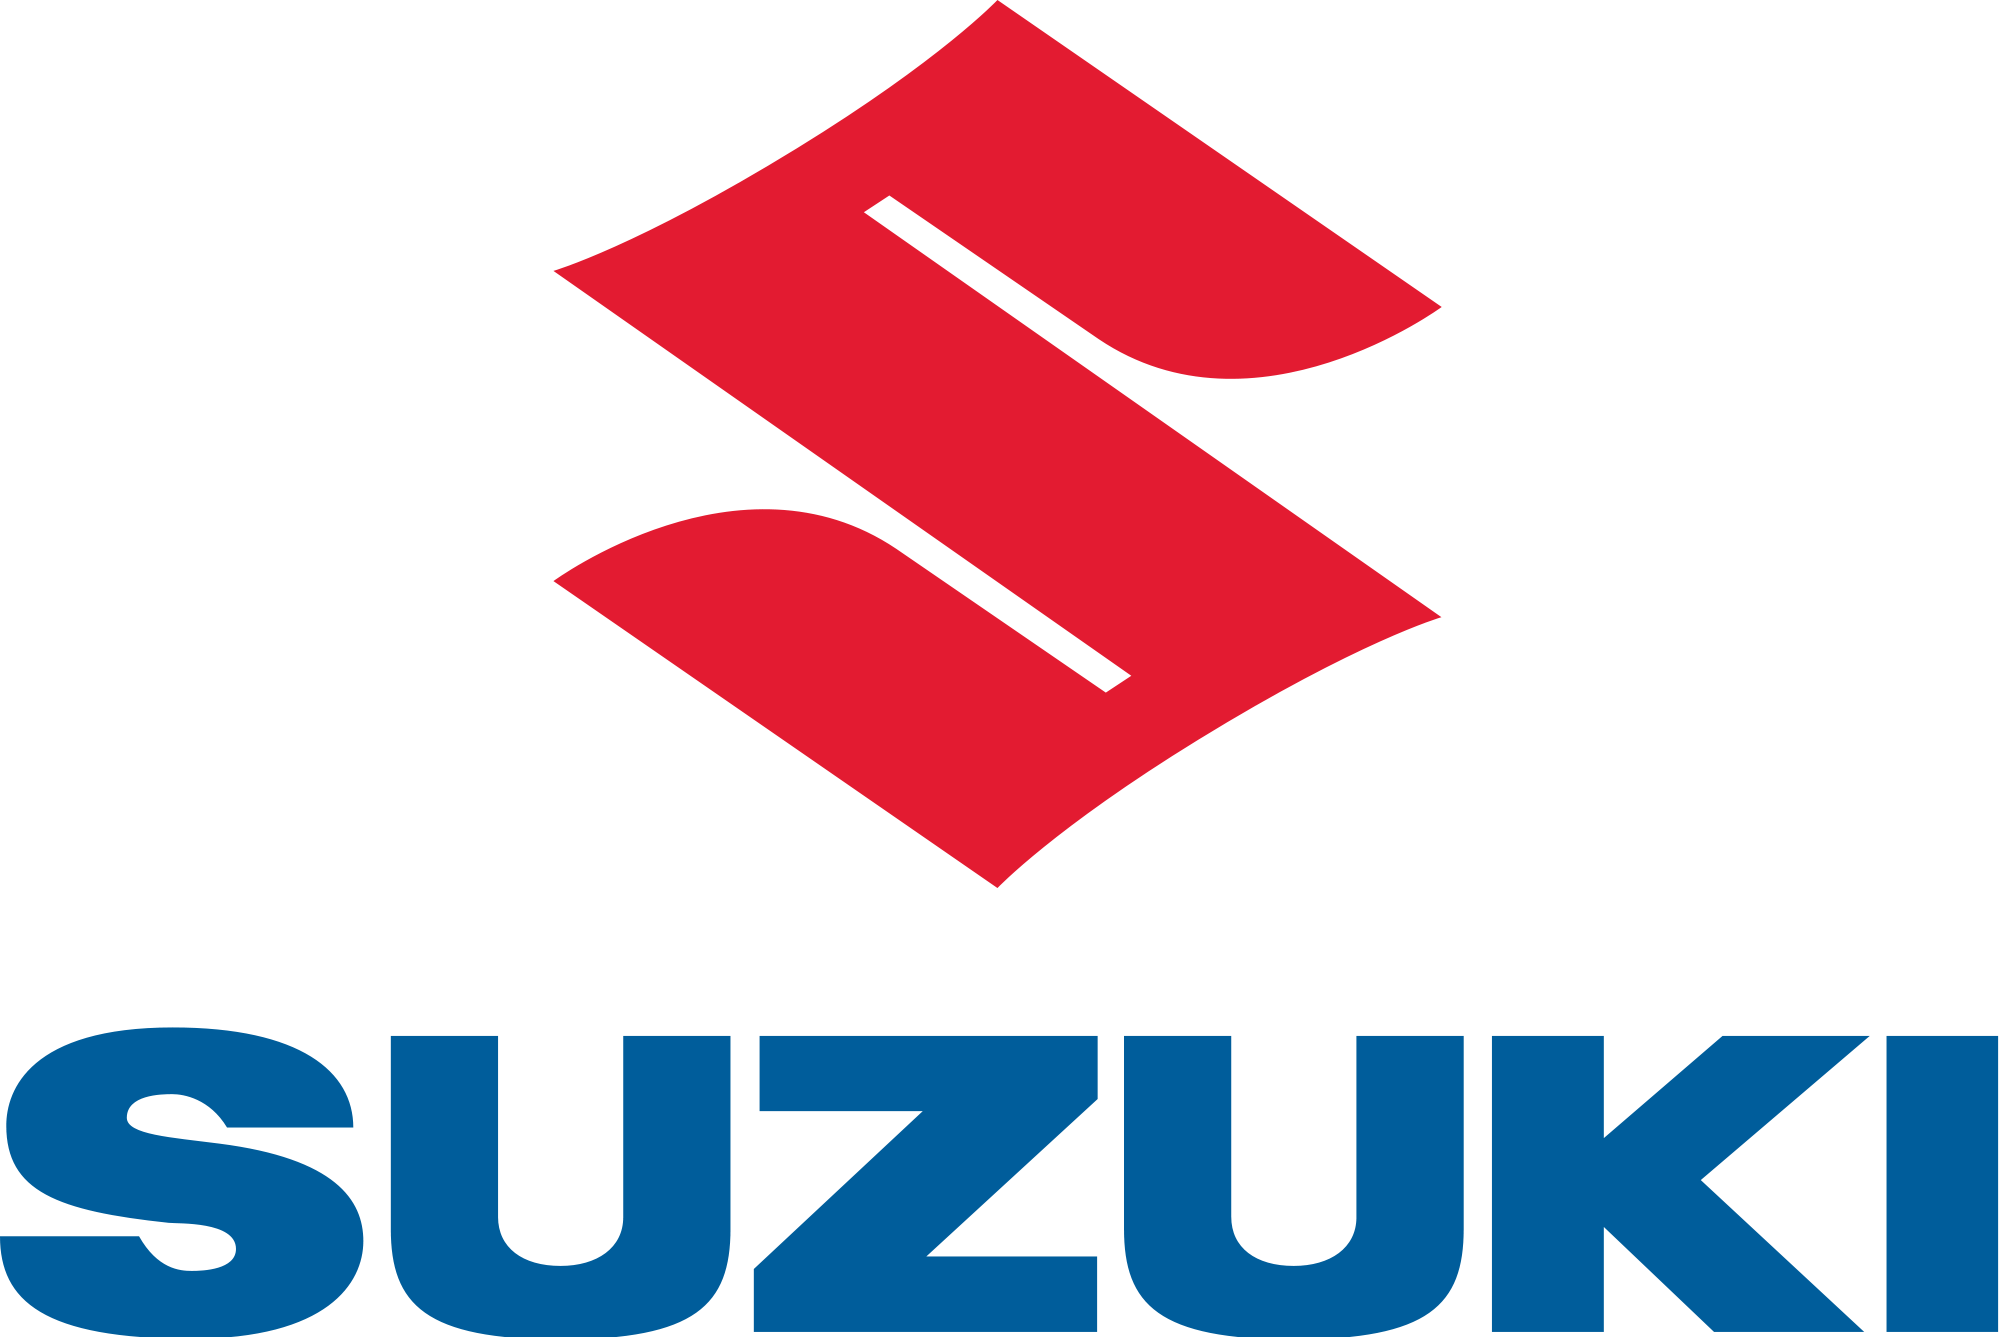 Suzuki Motorcycle Specifications